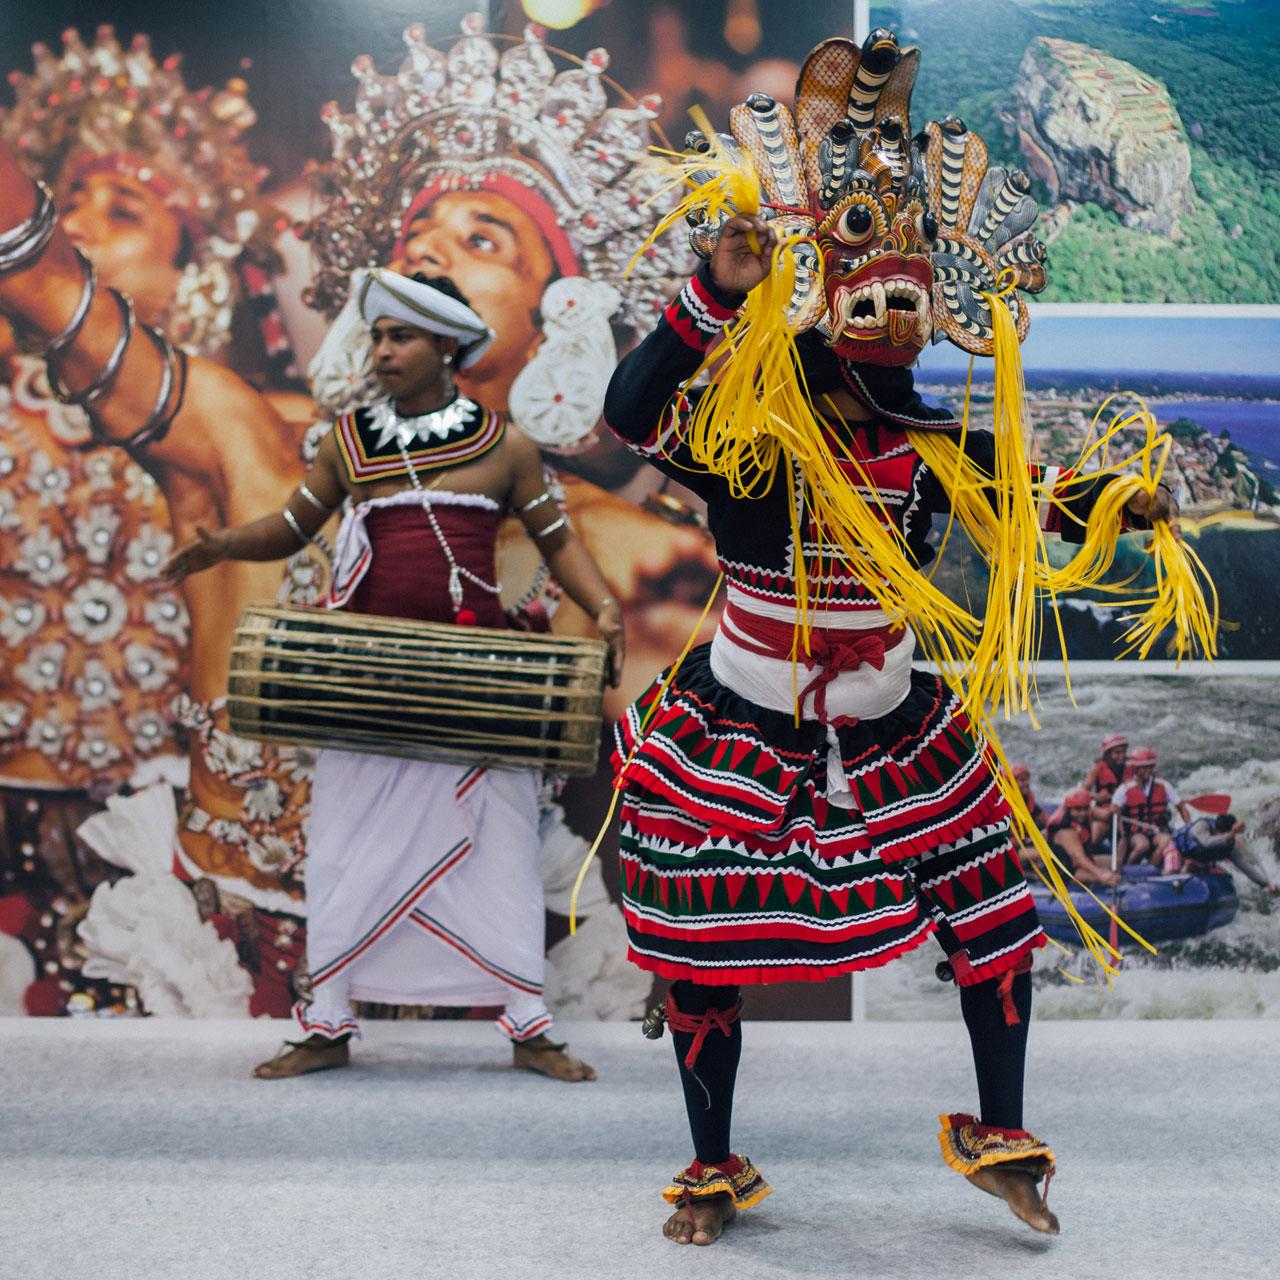 Sri Lanka national costumes